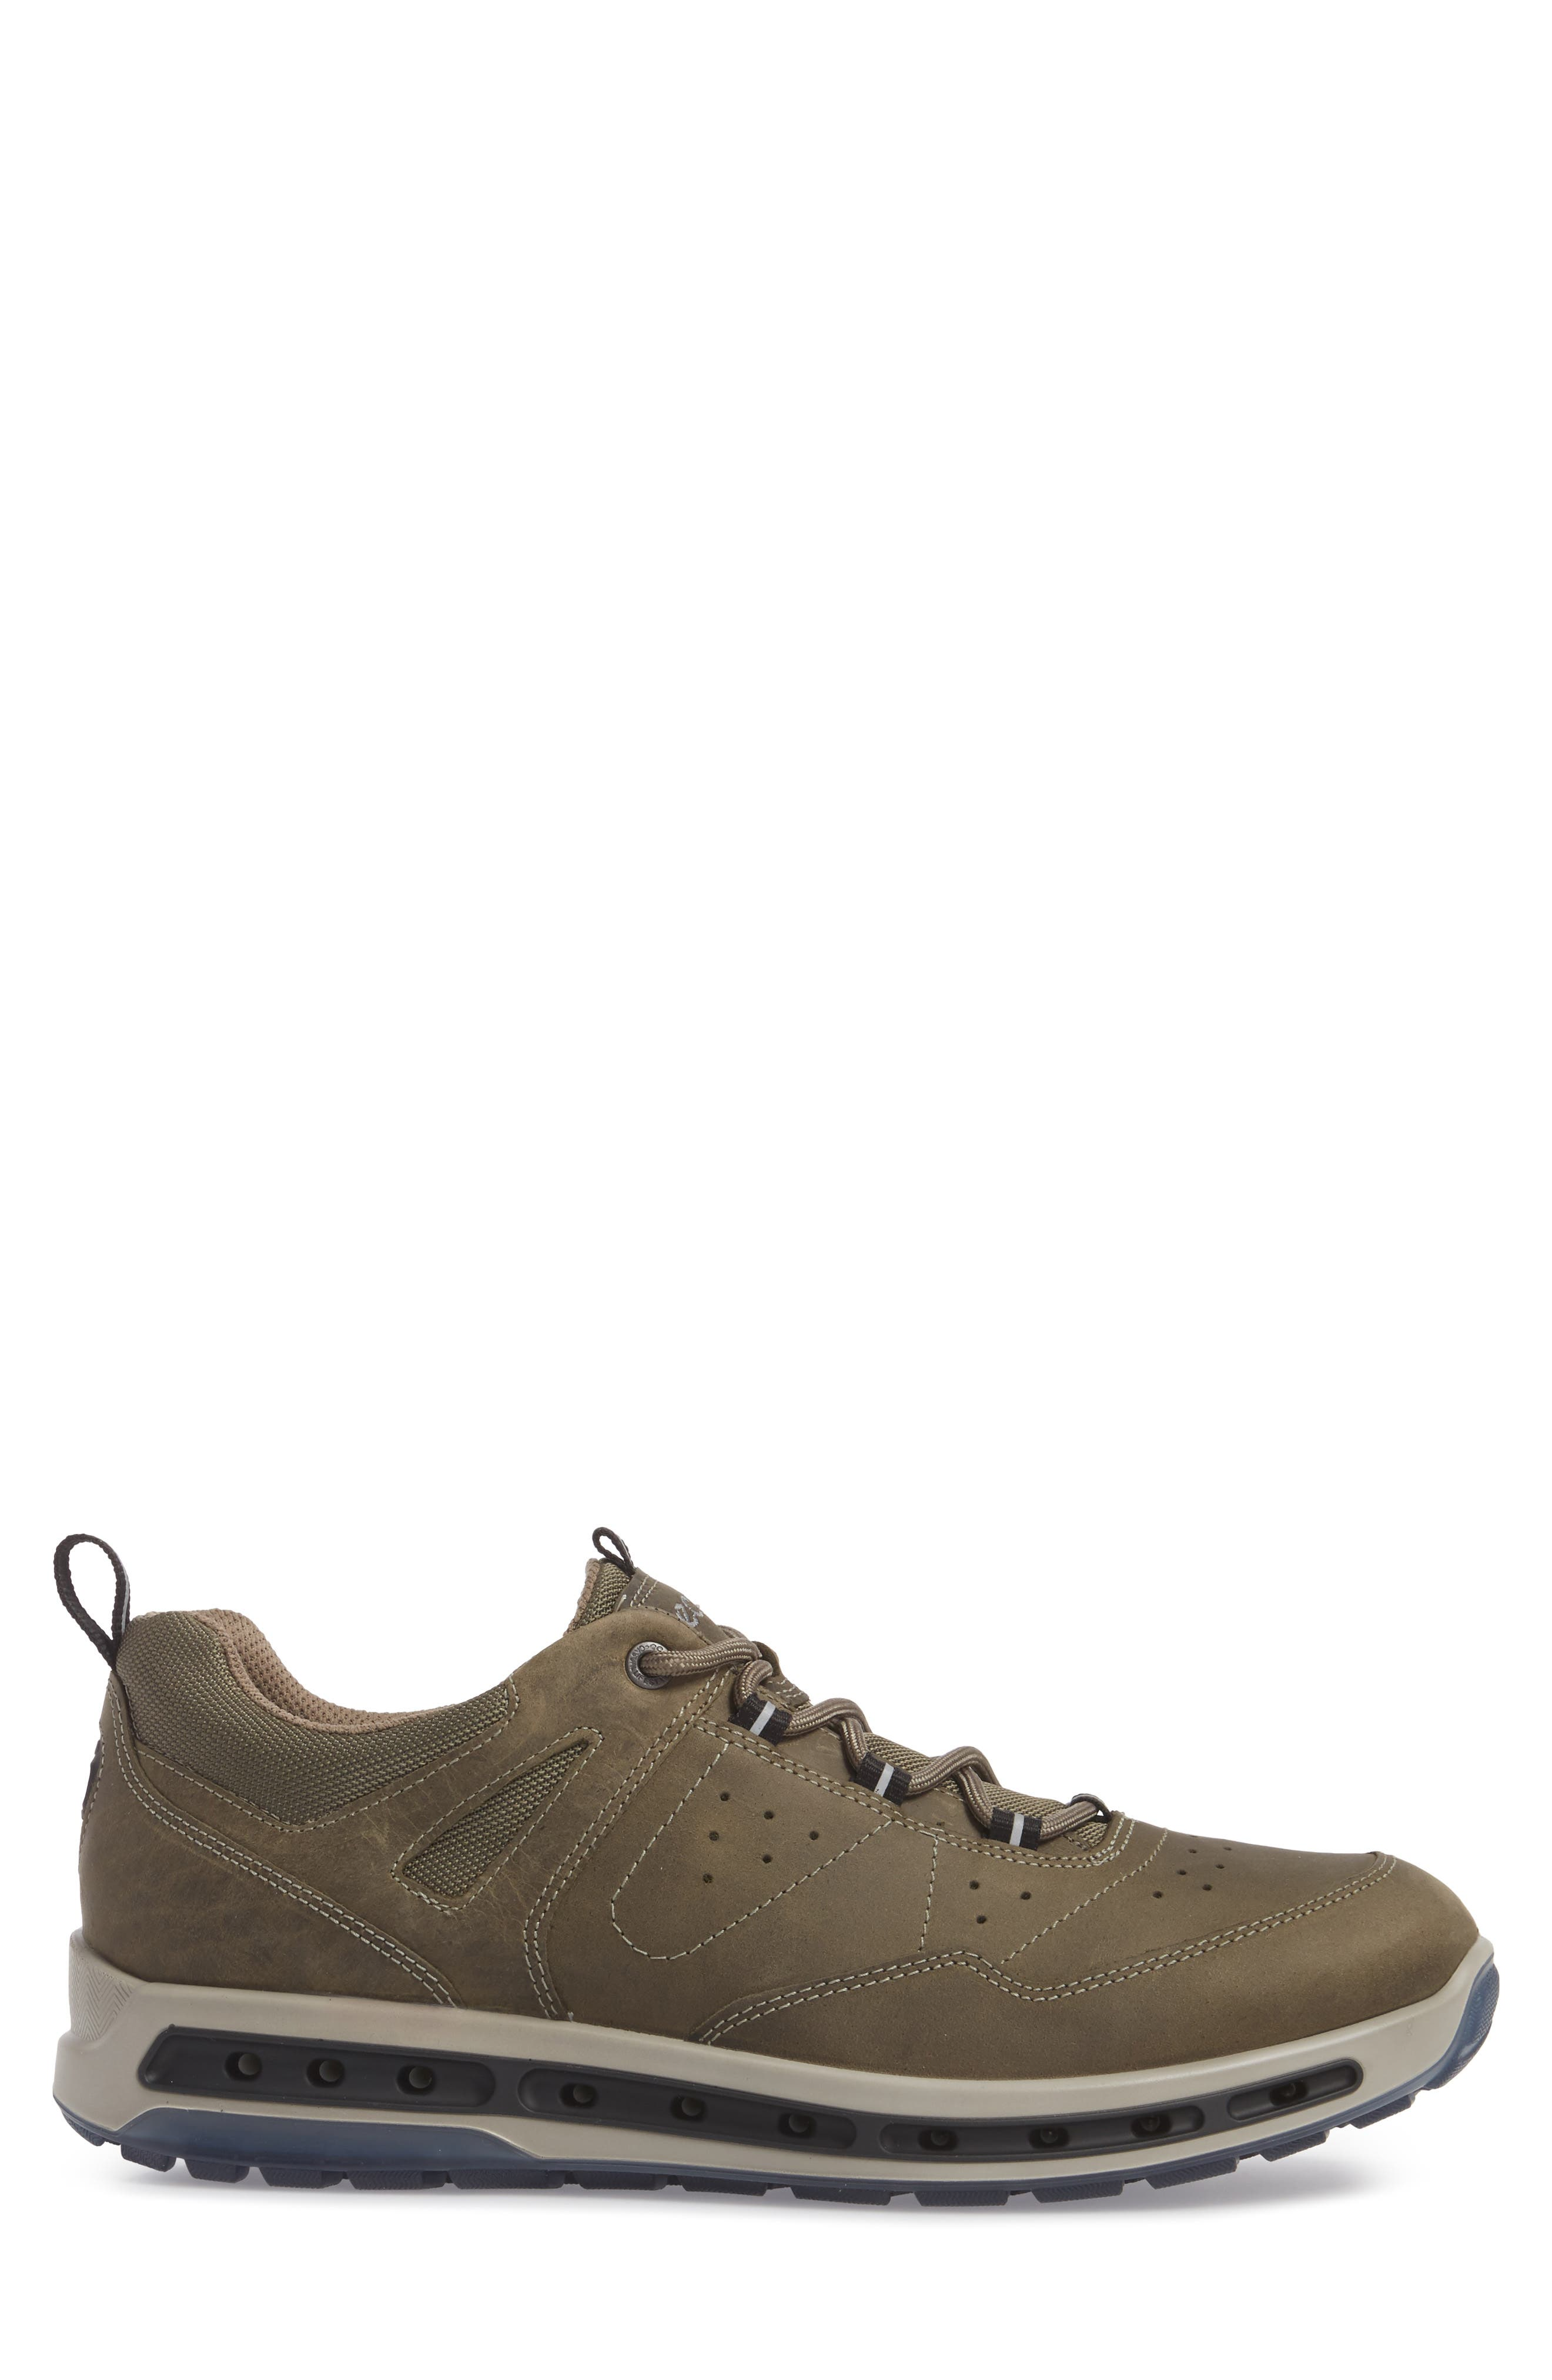 Cool Walk Gore-Tex<sup>®</sup> Sneaker,                             Alternate thumbnail 3, color,                             Tarmac Leather